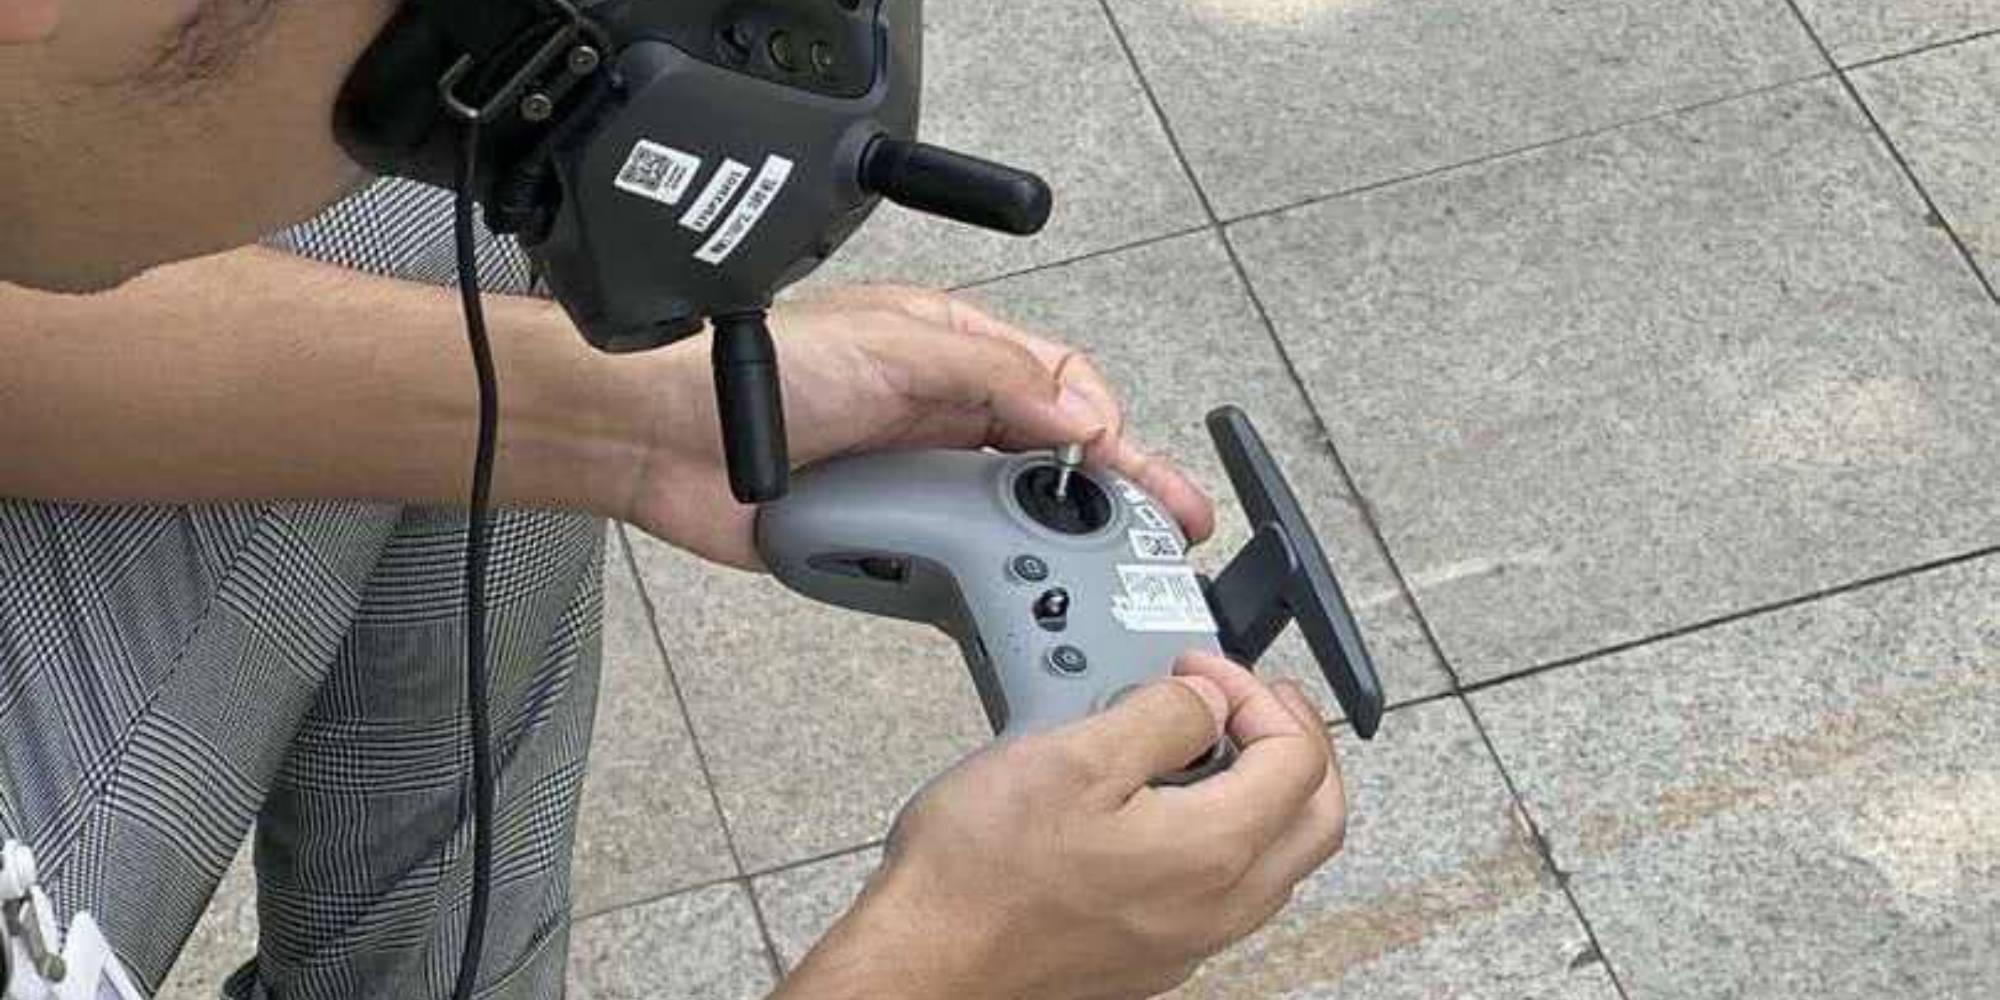 DJI's Digital FPV controller